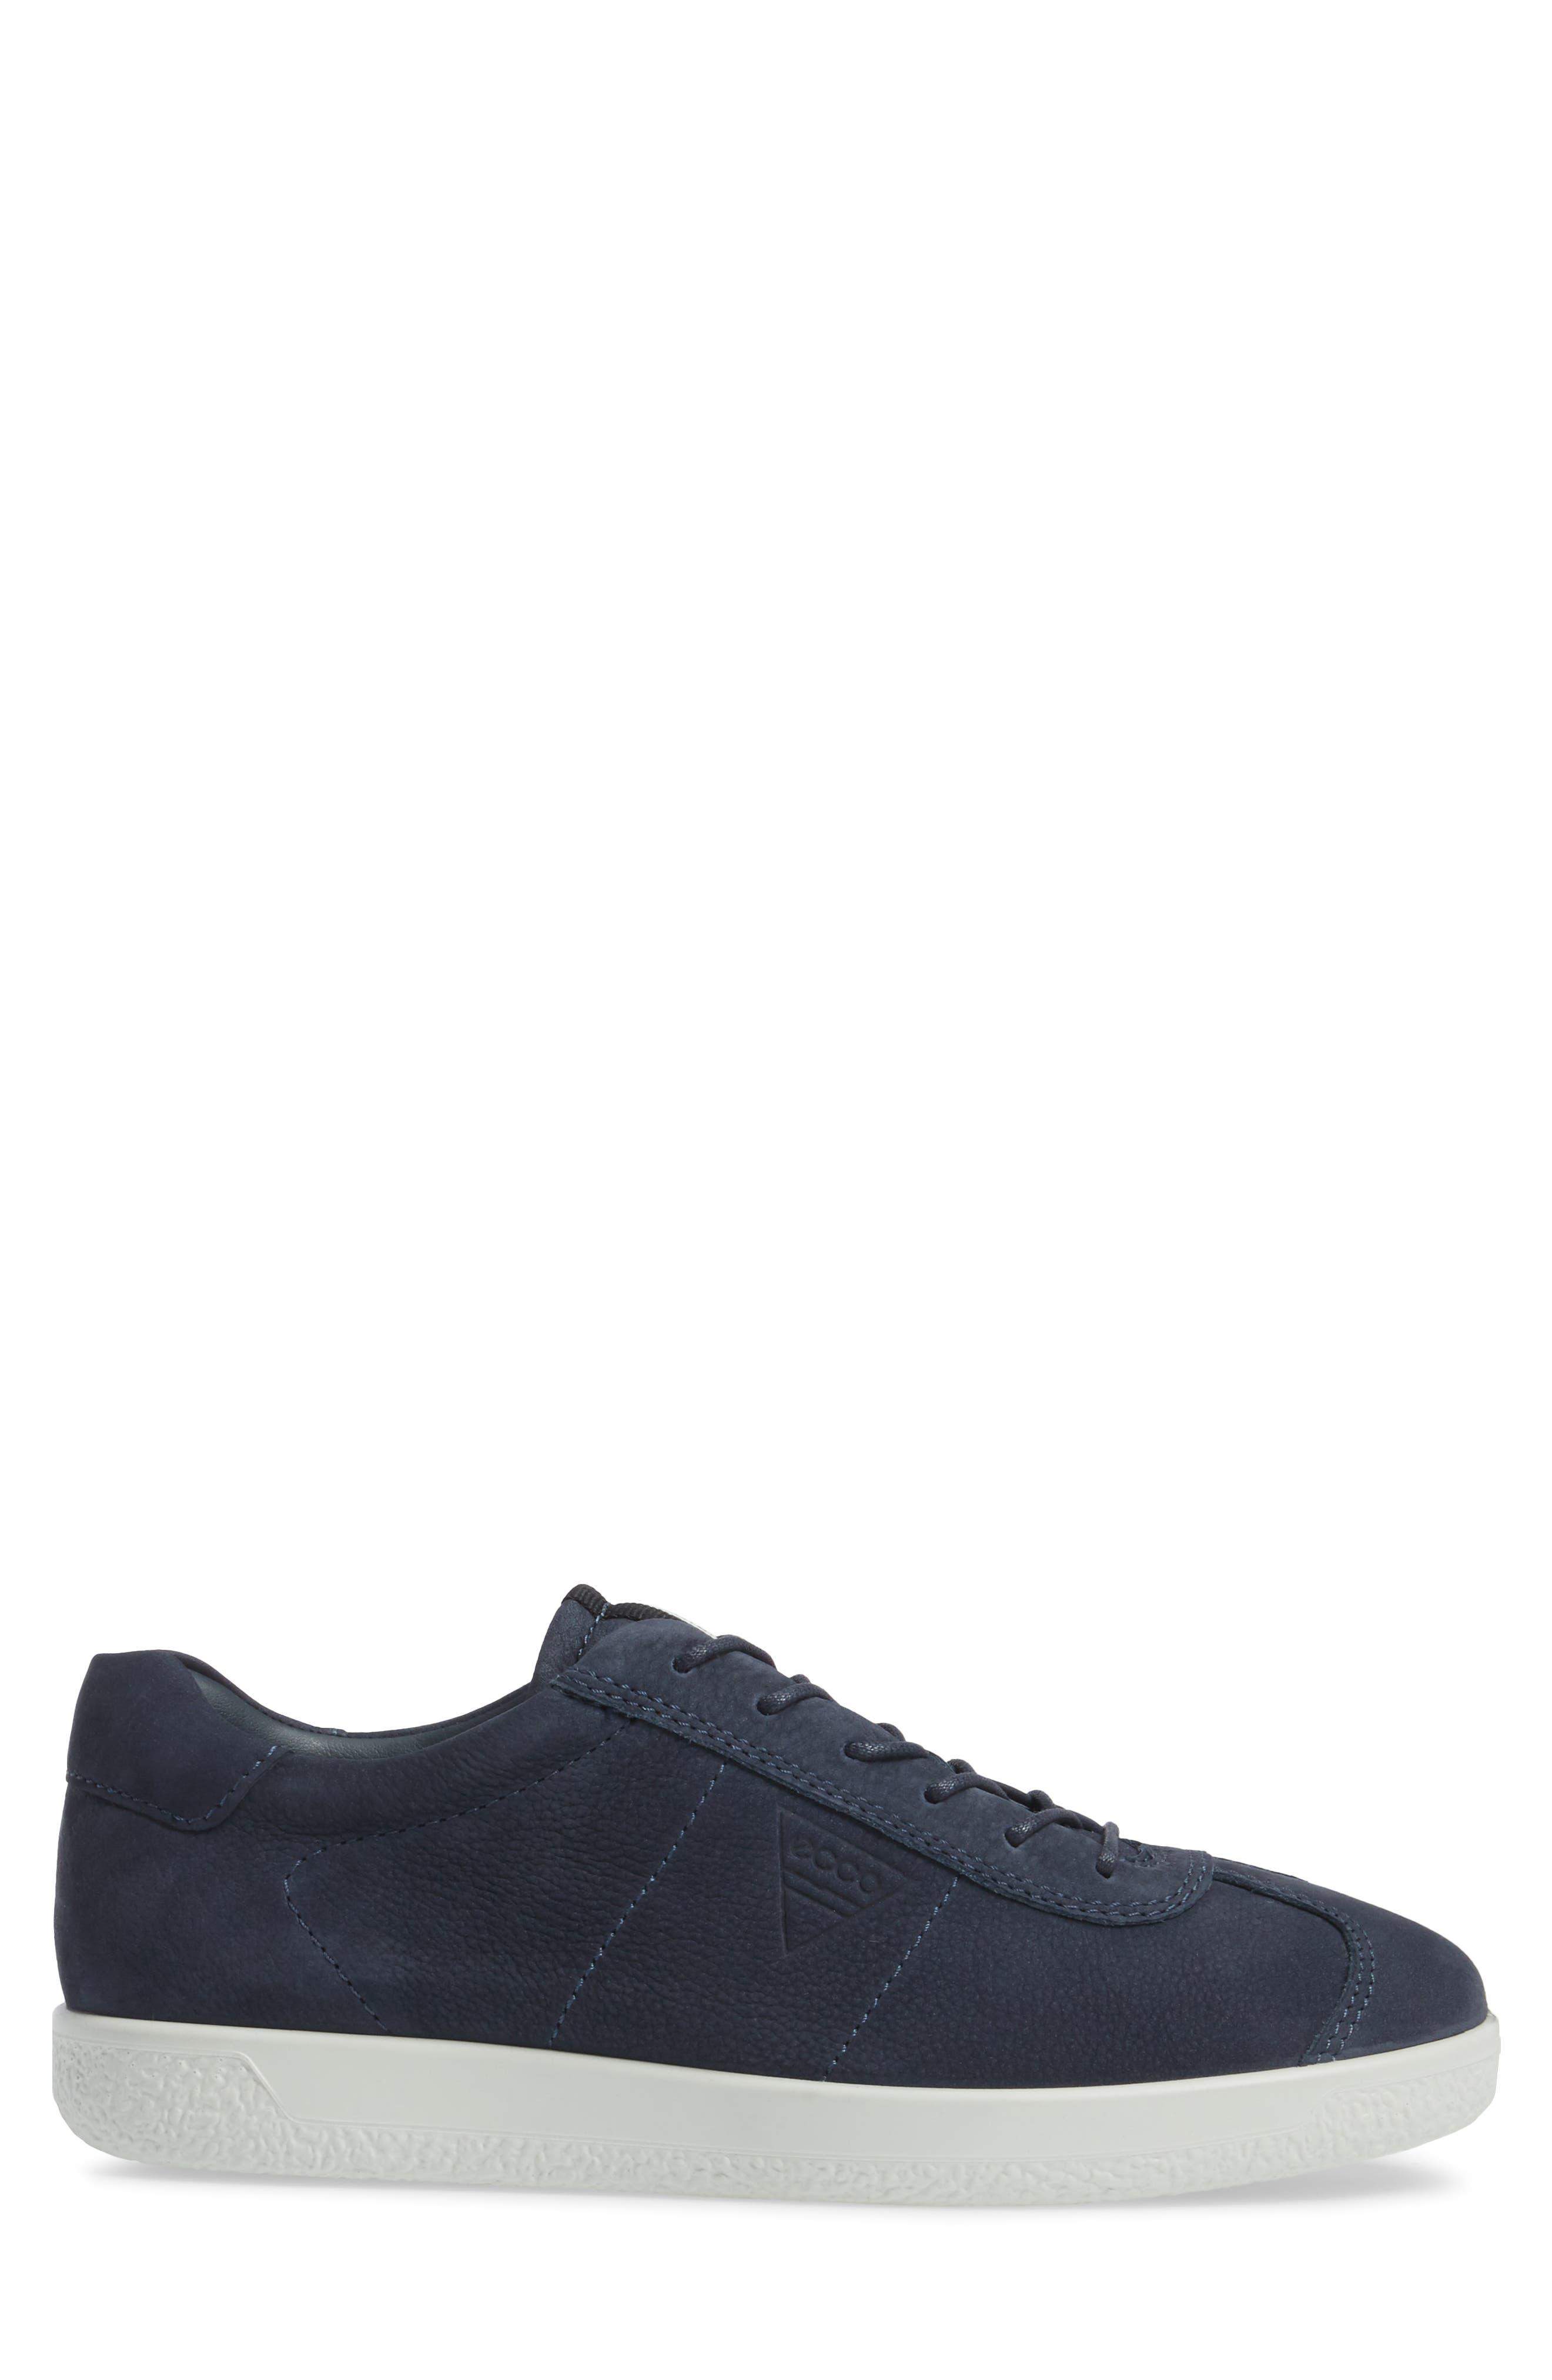 Soft 1 Sneaker,                             Alternate thumbnail 3, color,                             Marine Nubuck